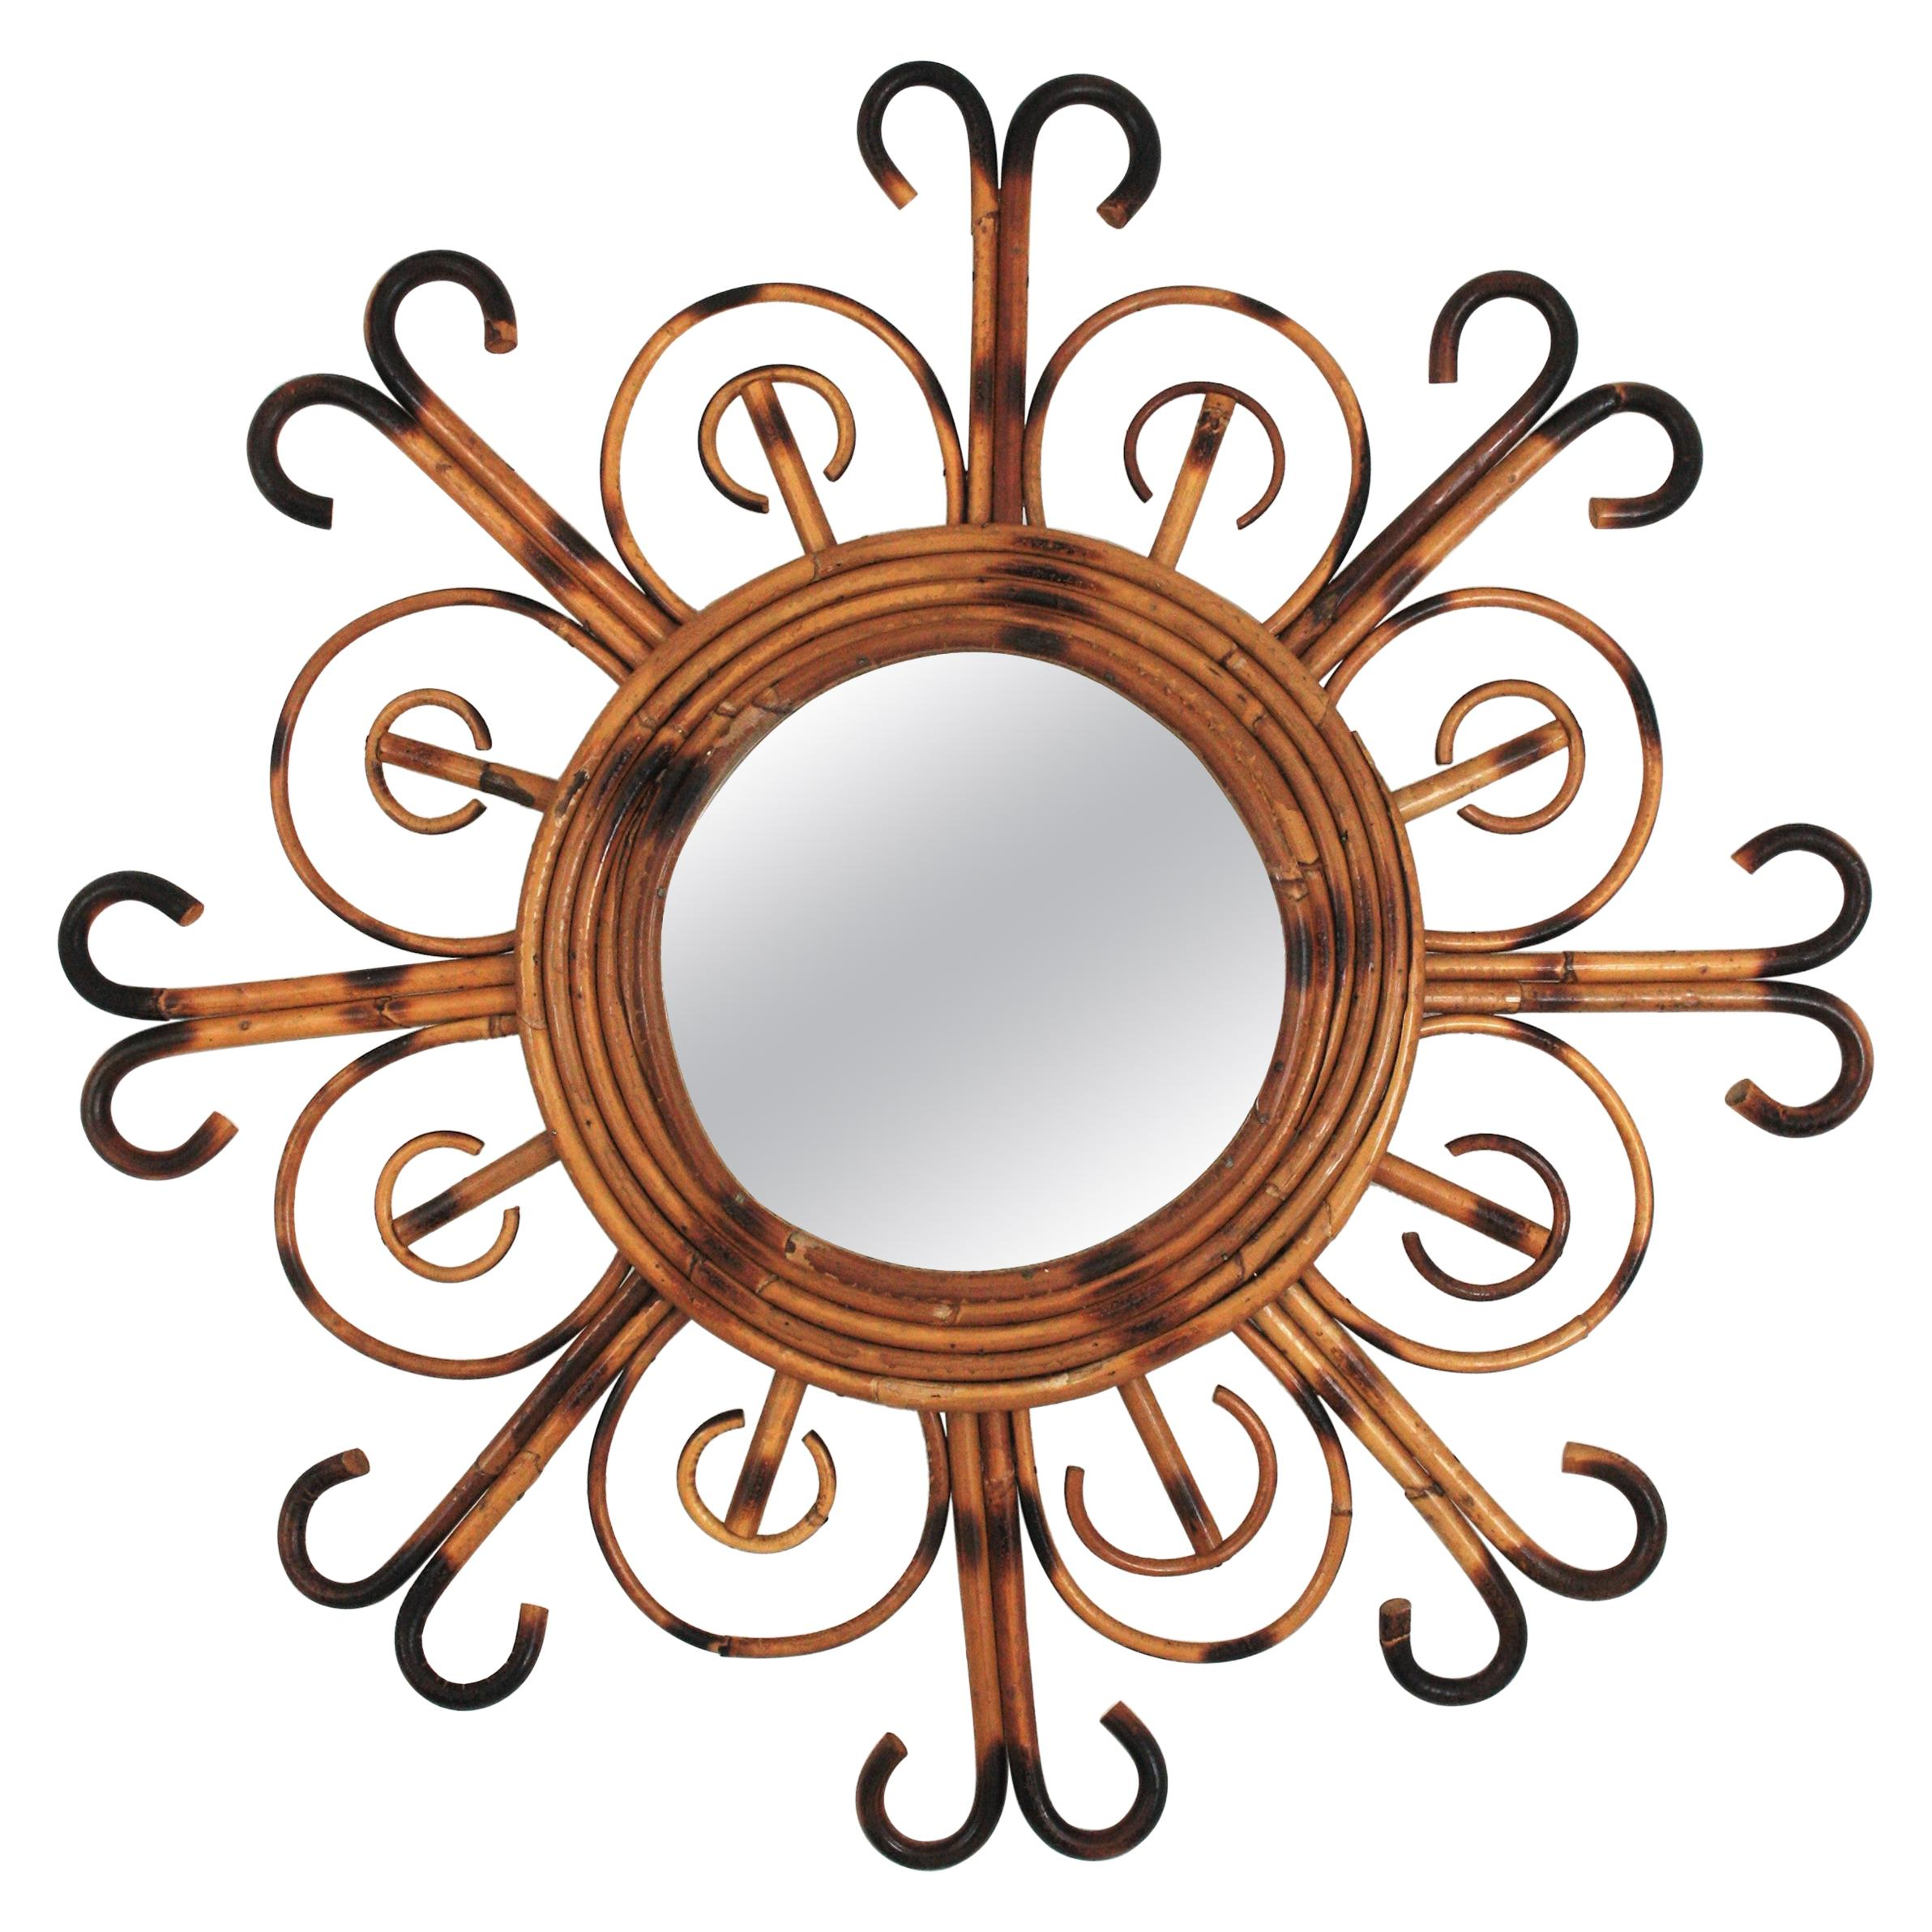 French Riviera Rattan Sunburst Mirror, 1950s